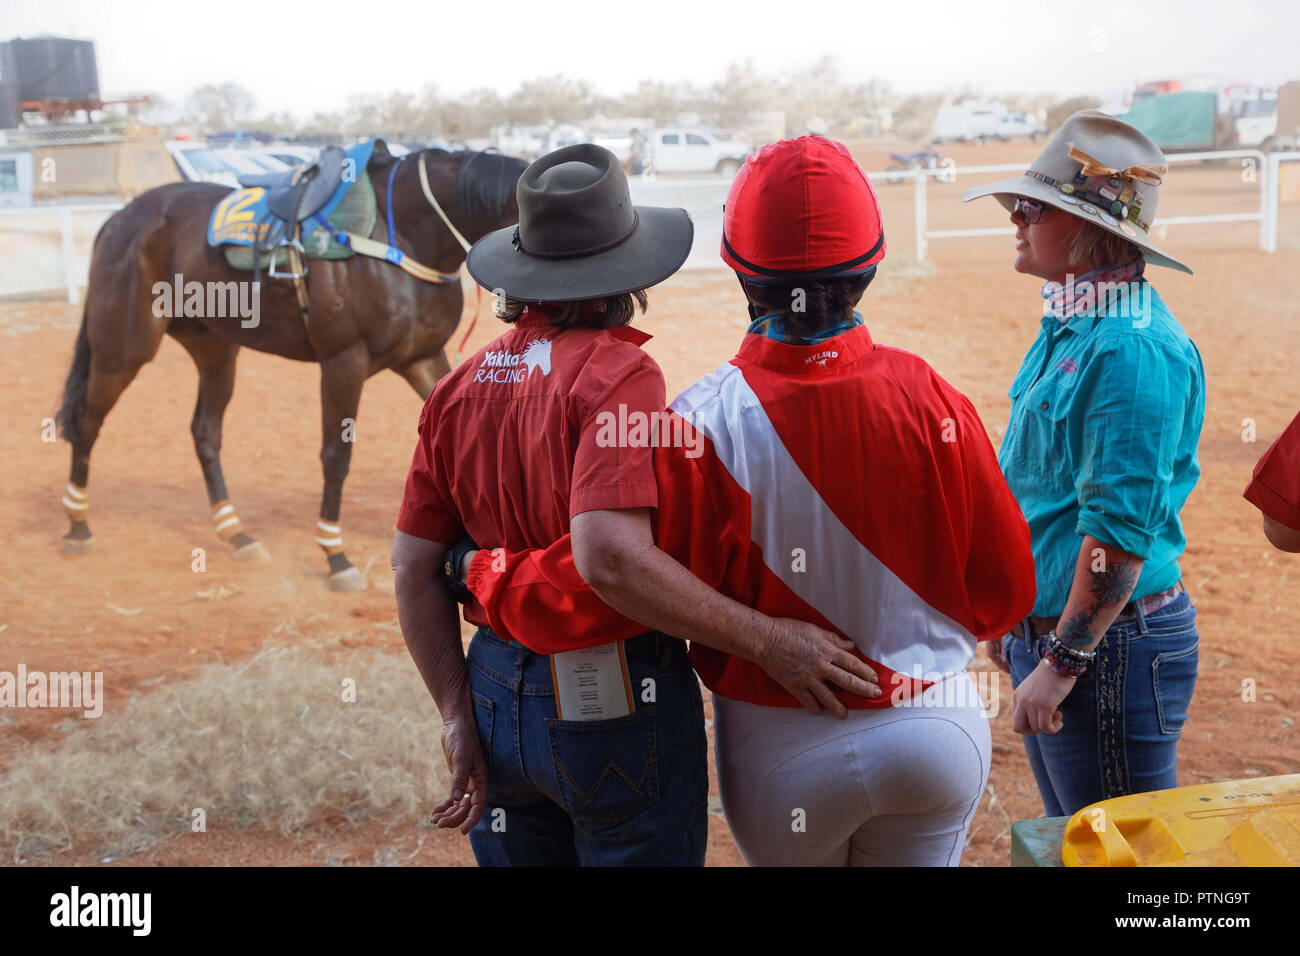 Landor,Station,Outback,Jackaroo,Aussie,horse,Australia,stockman,Austra - Stock Image